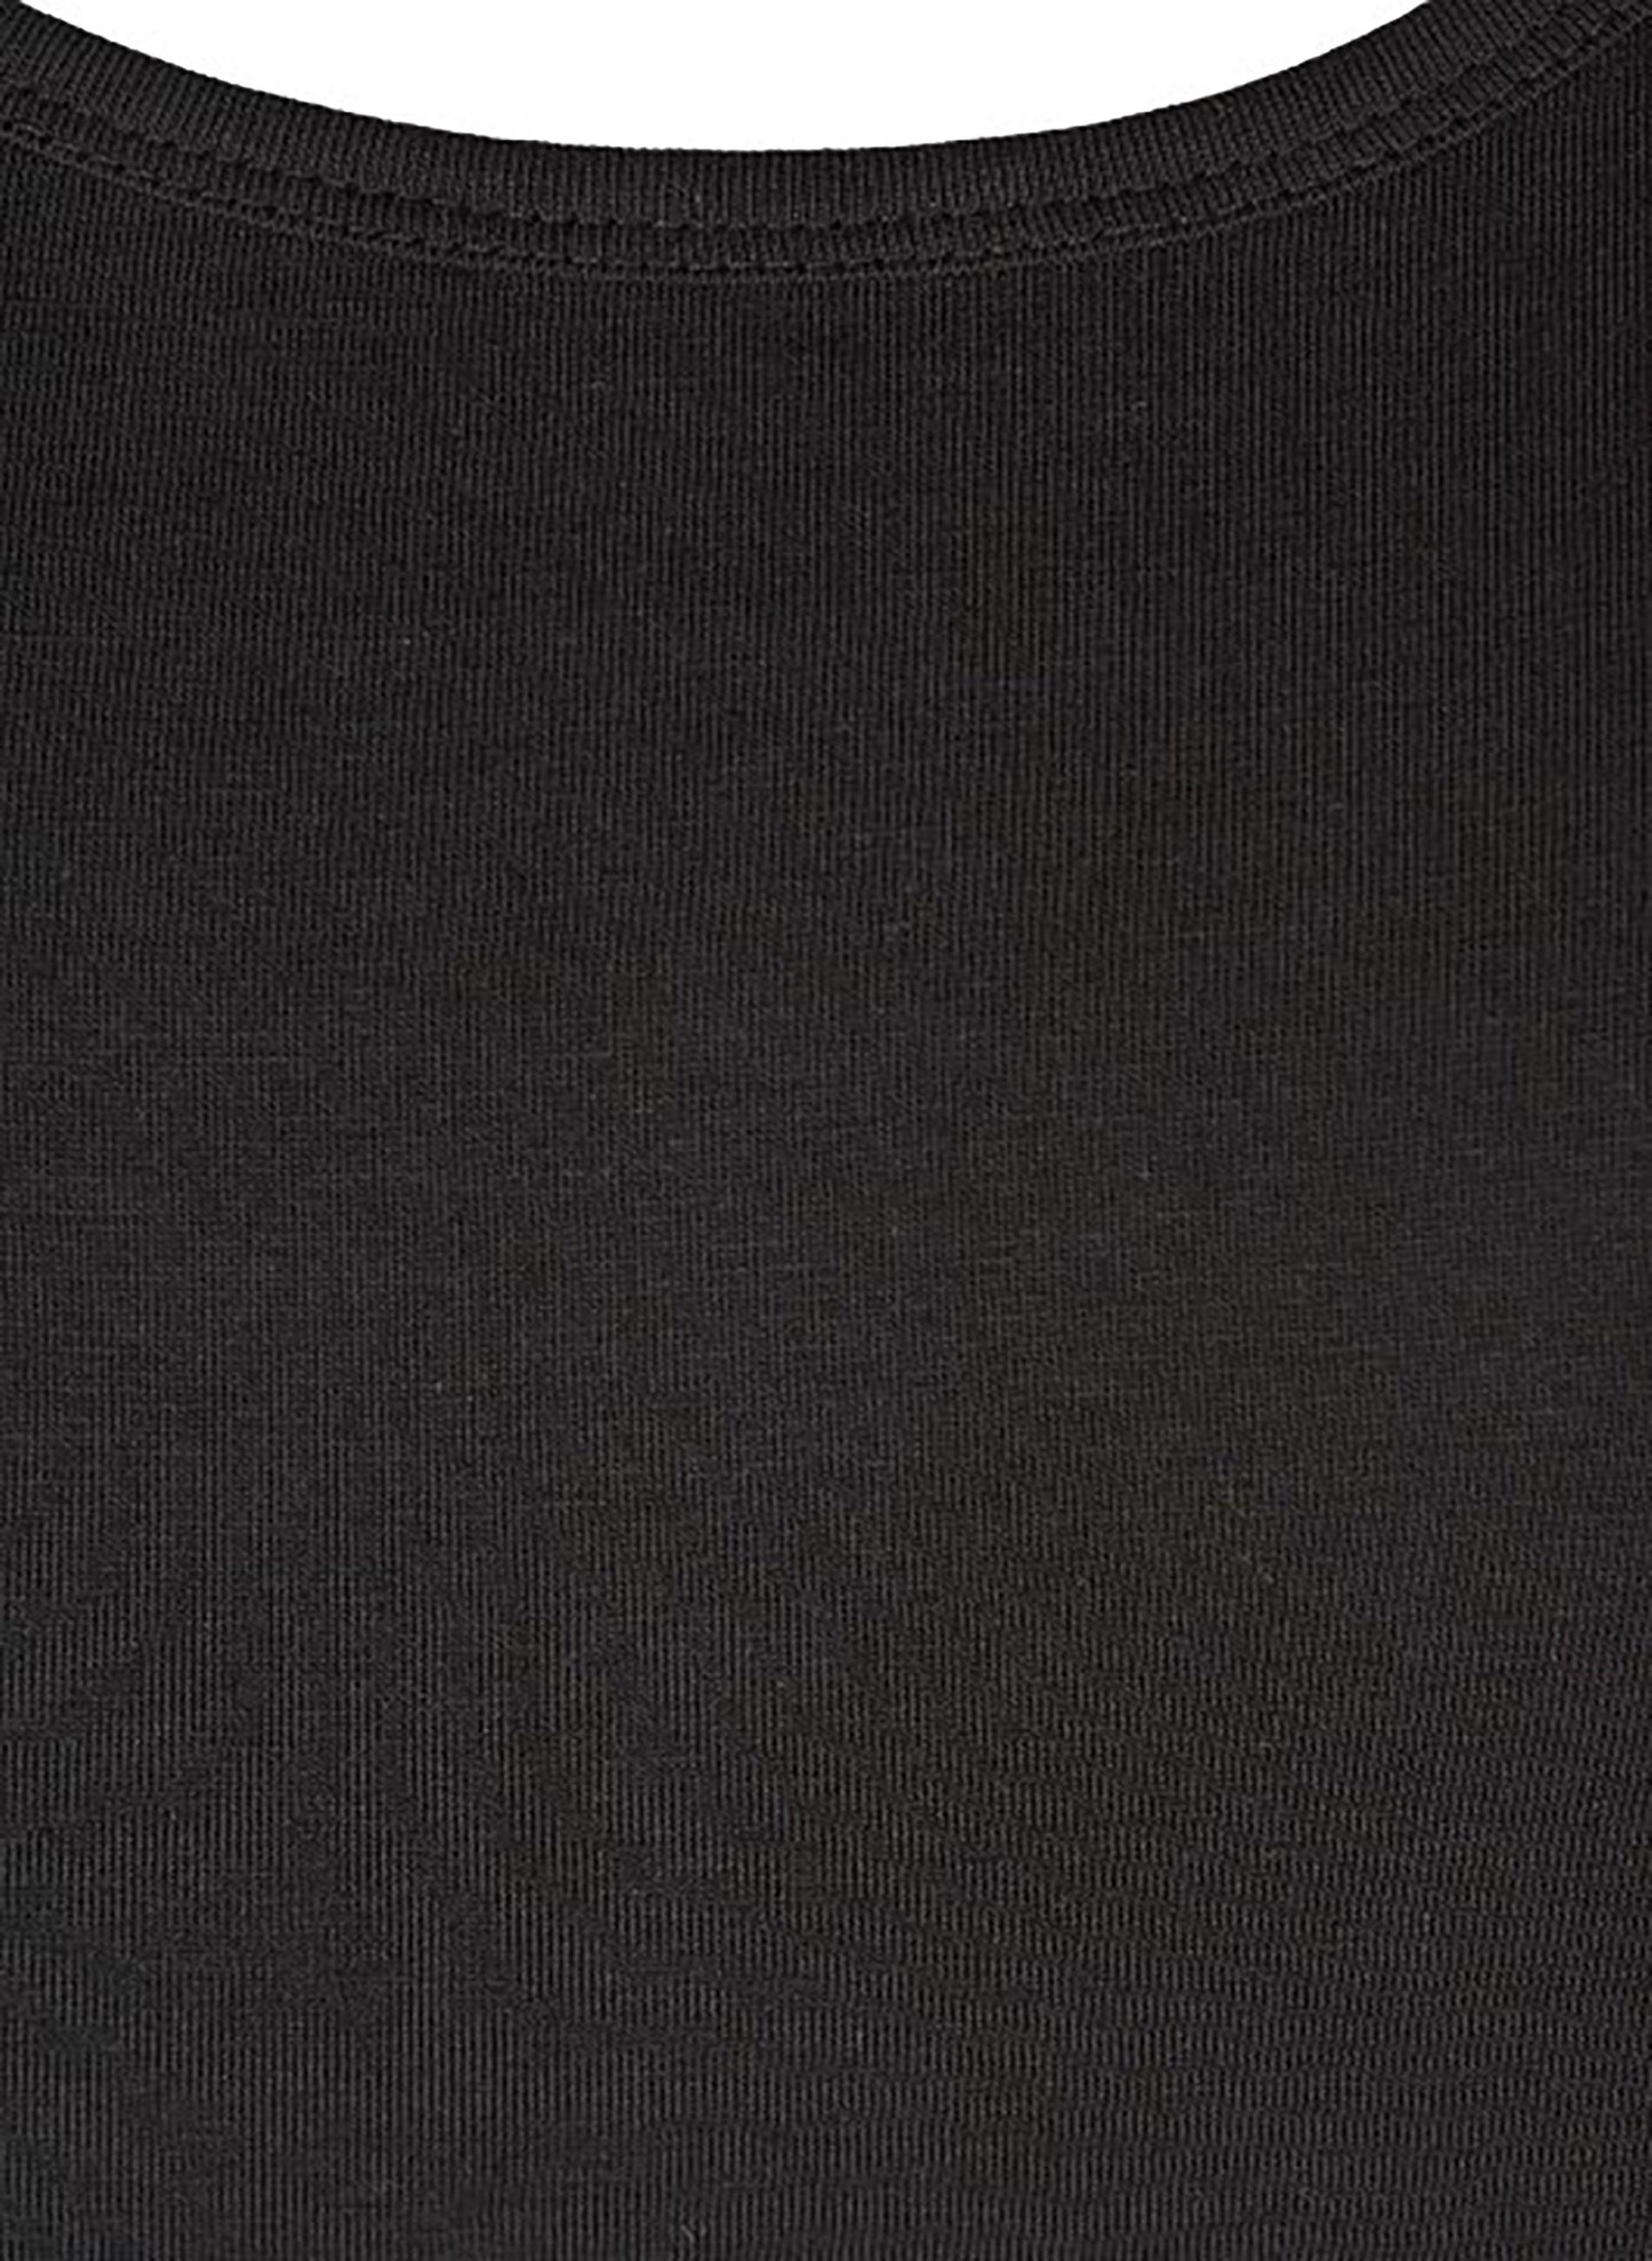 a40505fe4eb9 ΜΕΓΑΛΑ ΜΕΓΕΘΗ ΦΟΡΕΜΑΤΑ    Φόρεμα Μάξι Μαύρο Βαμβακερό - Μόδα σε ...